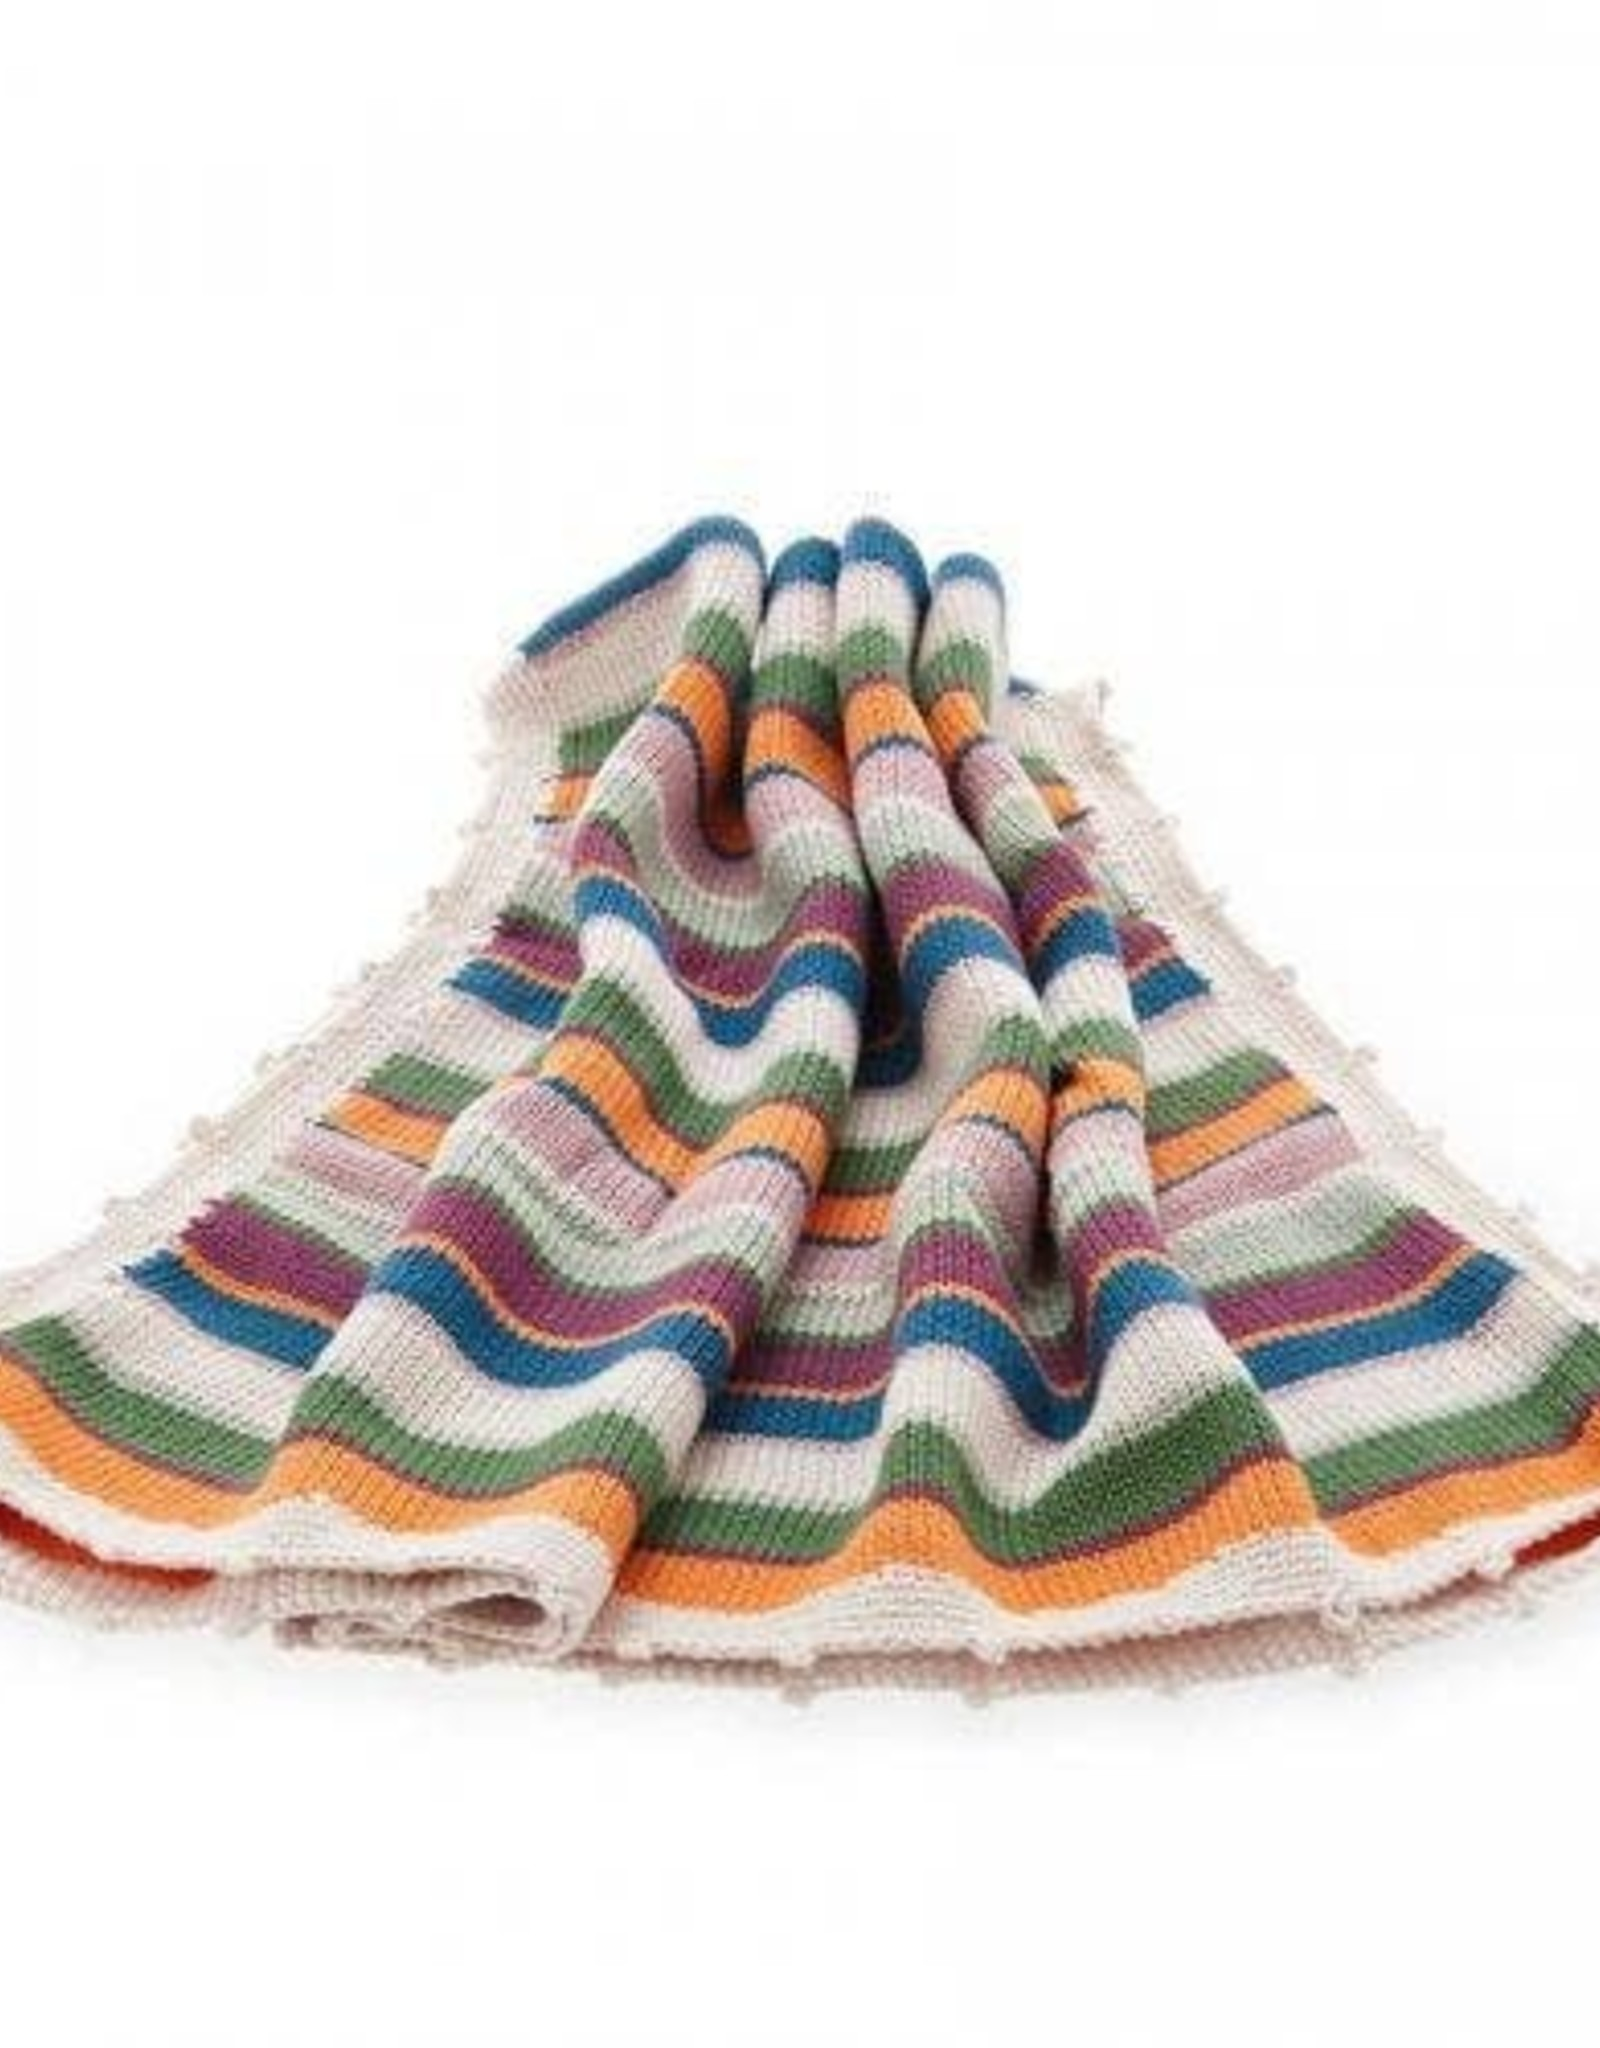 Pebble Stripey Rainbow Blanket